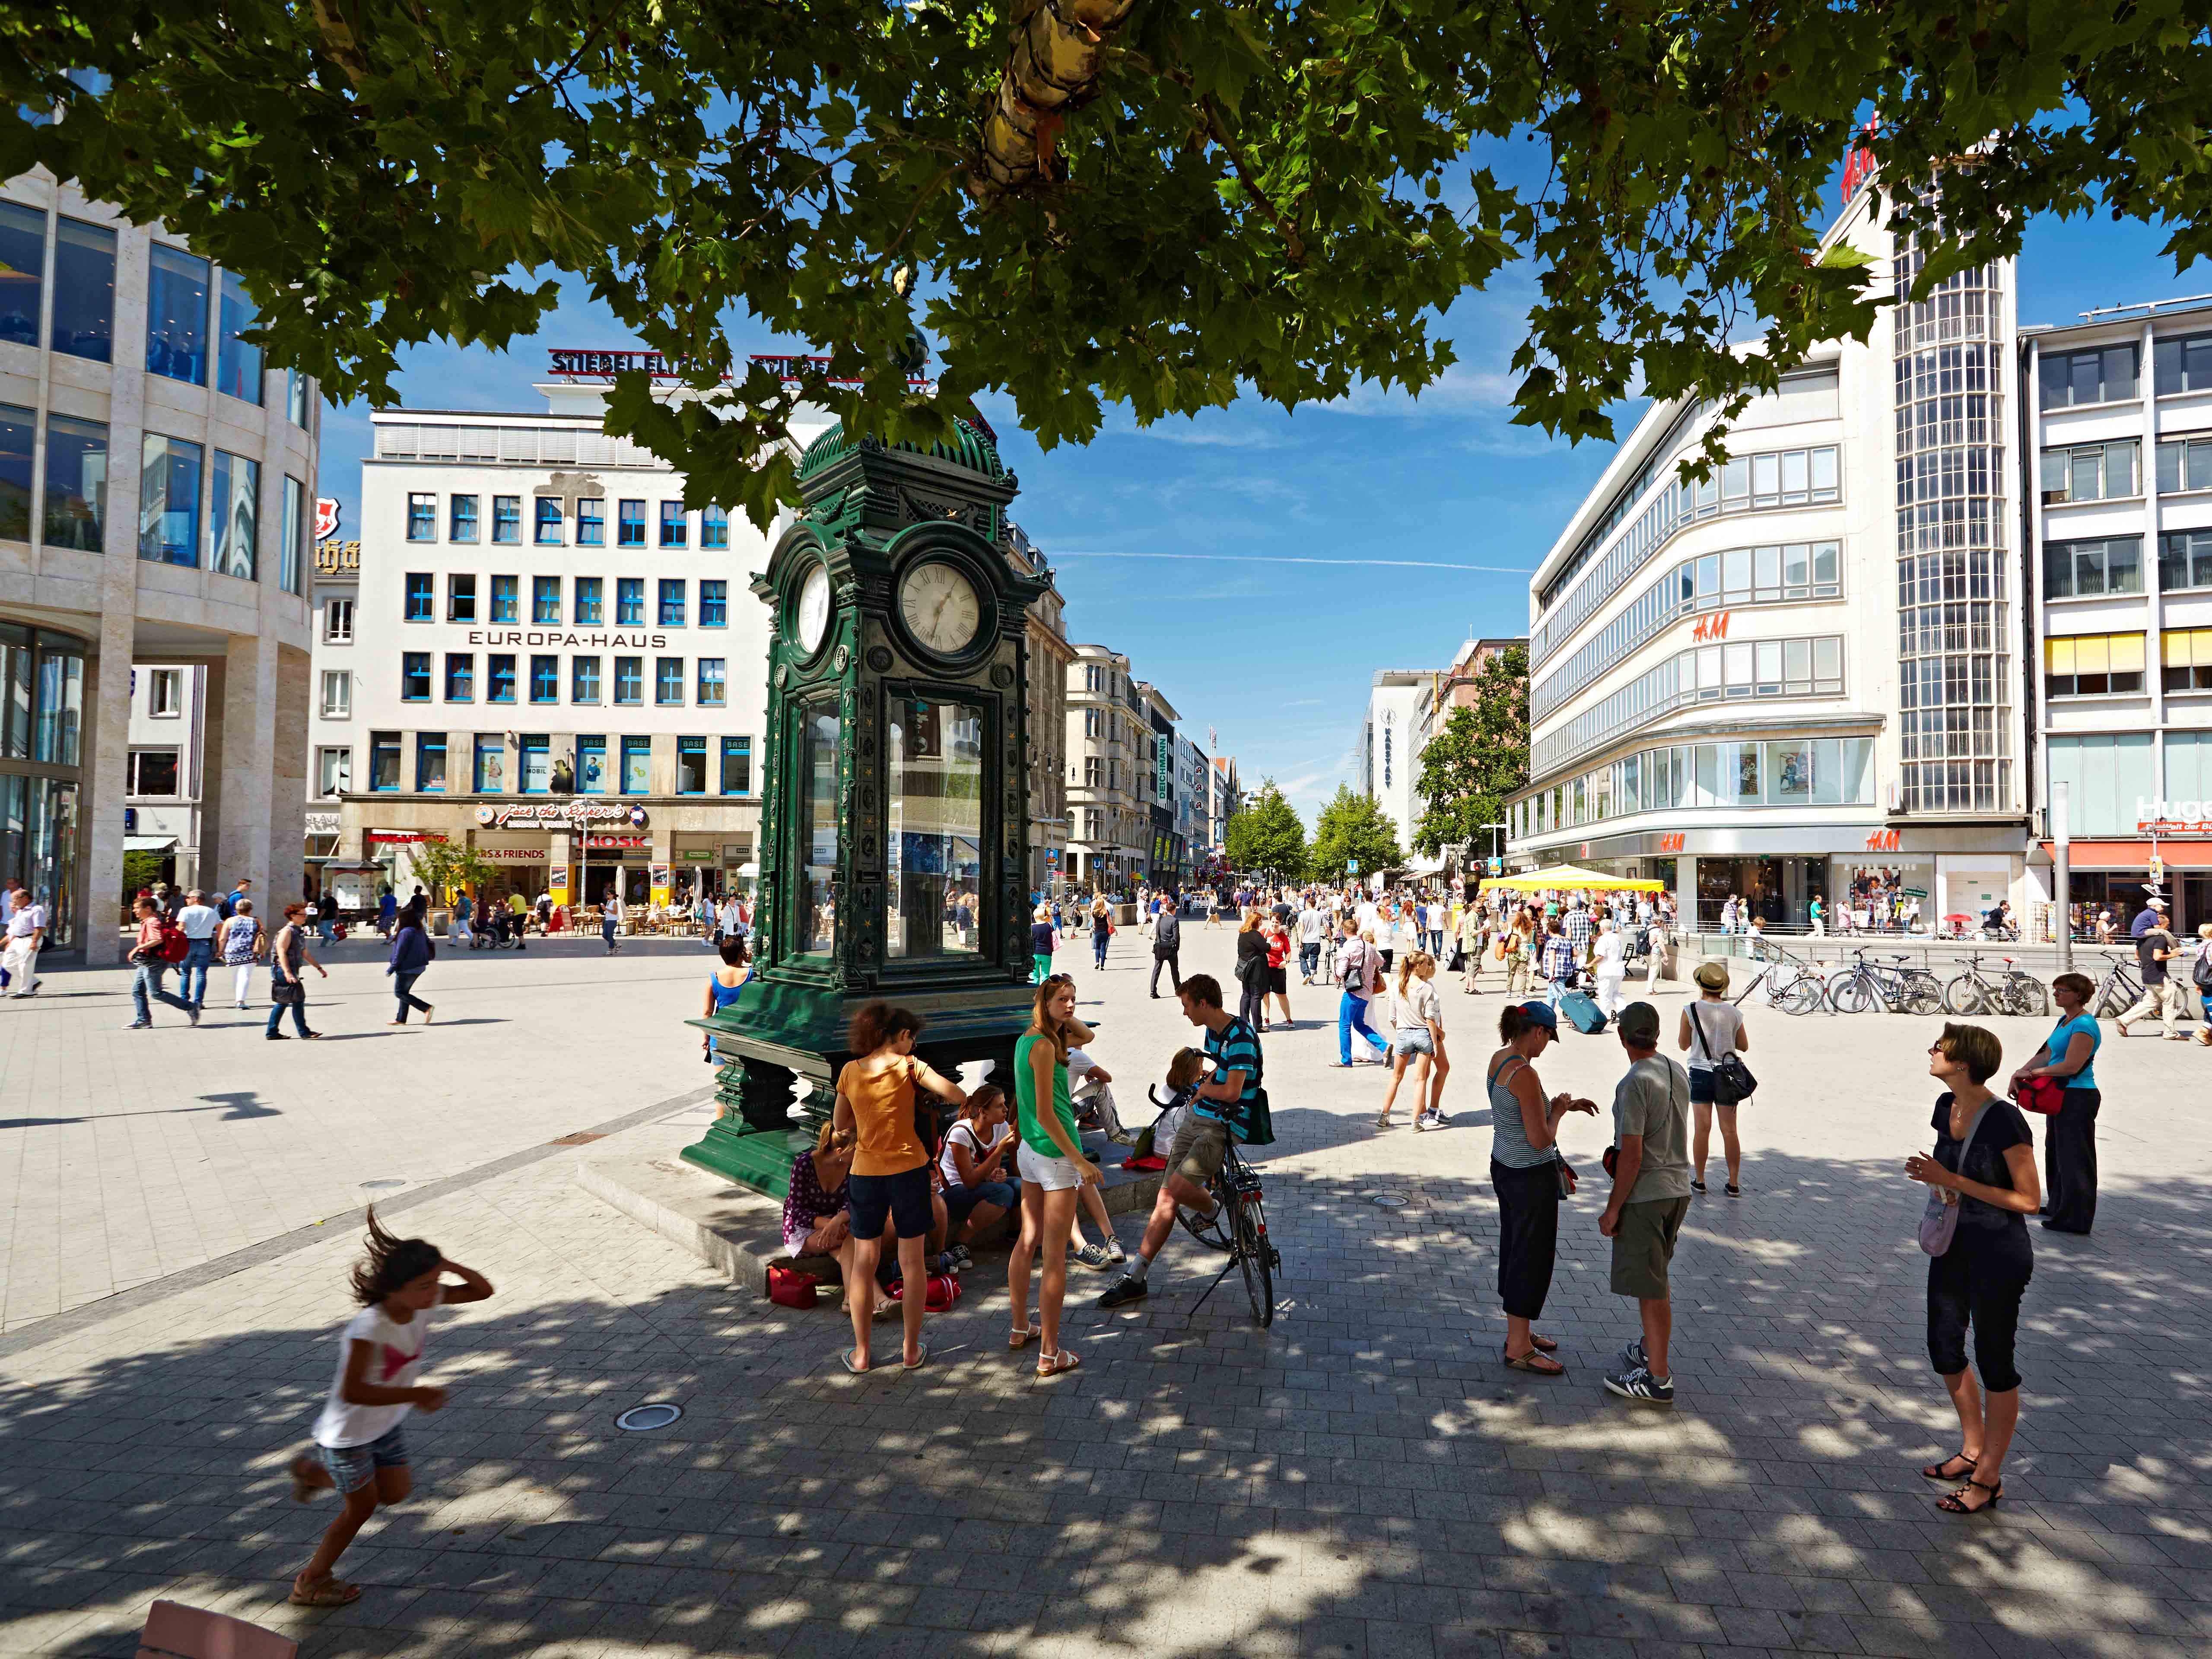 Hannover, DEU, 06.08.2013, Kröpcke[ (c) Christian Wyrwa, Diplom-Foto-Designer (FH),  Burgwedeler Str. 91D , 30916 Isernhagen (bei Hannover), Germany, E-Mail: info@wyrwa-foto.de,  Tel: +49-511-3945254, Fax:+49-511-1233545, Mobil: +49-171-8340094, ] [#0,26,121#]